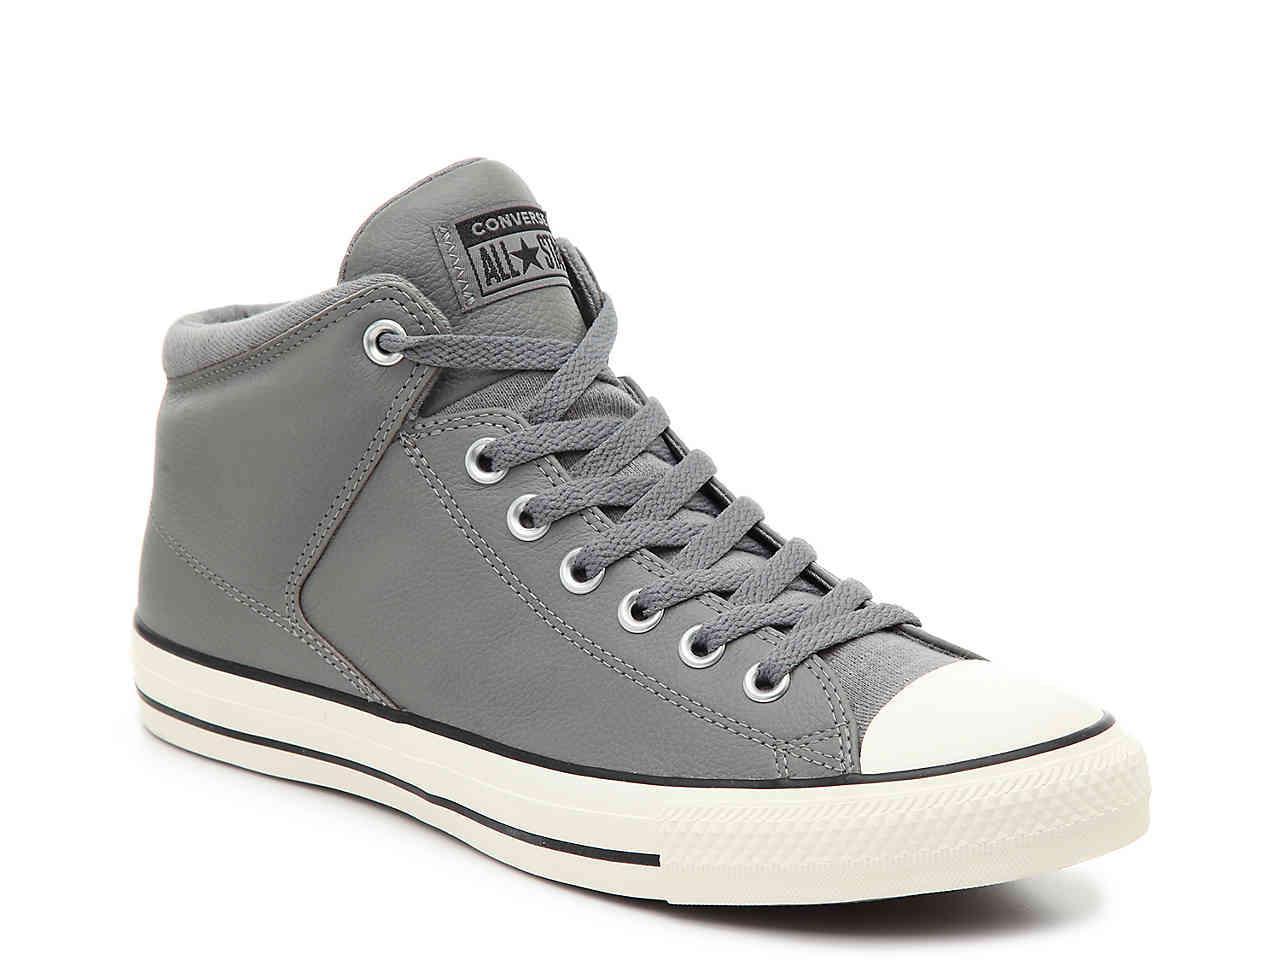 8c71e9526f6b56 Converse. Men s Gray Chuck Taylor All Star Hi Street Leather High-top  Sneaker